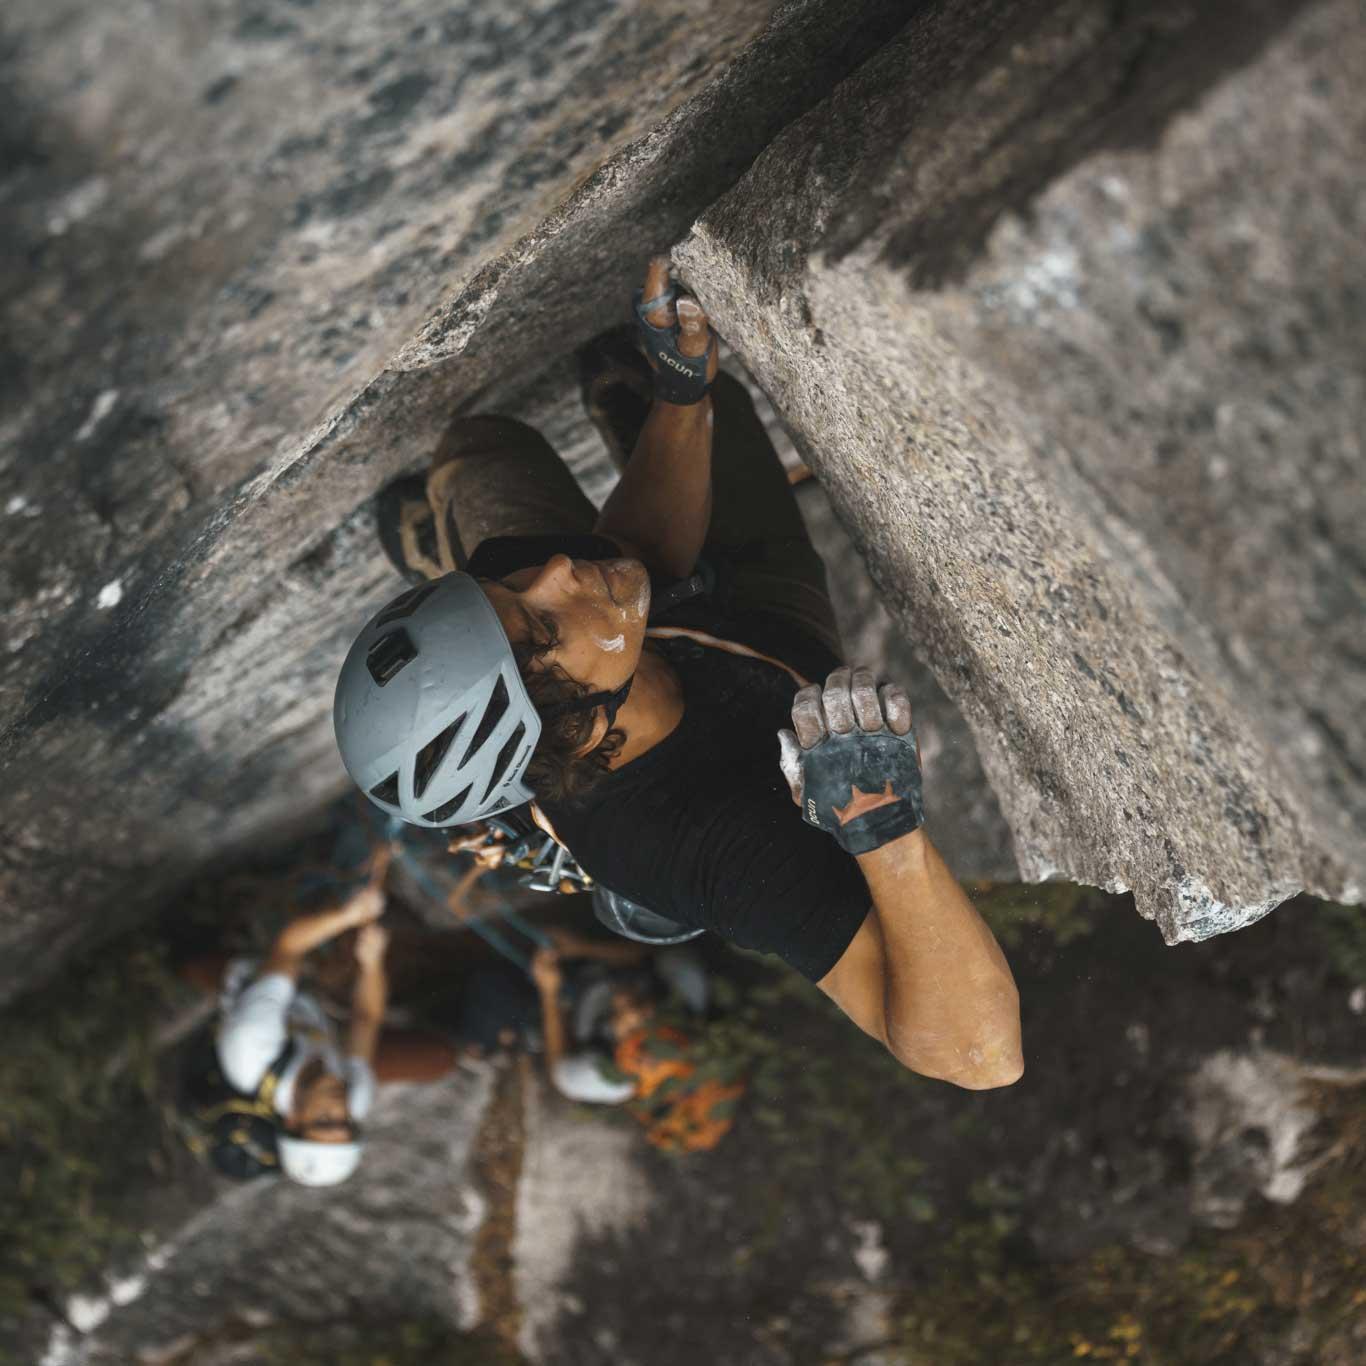 Man wearing Foehn Nelson Pant while rock climbing